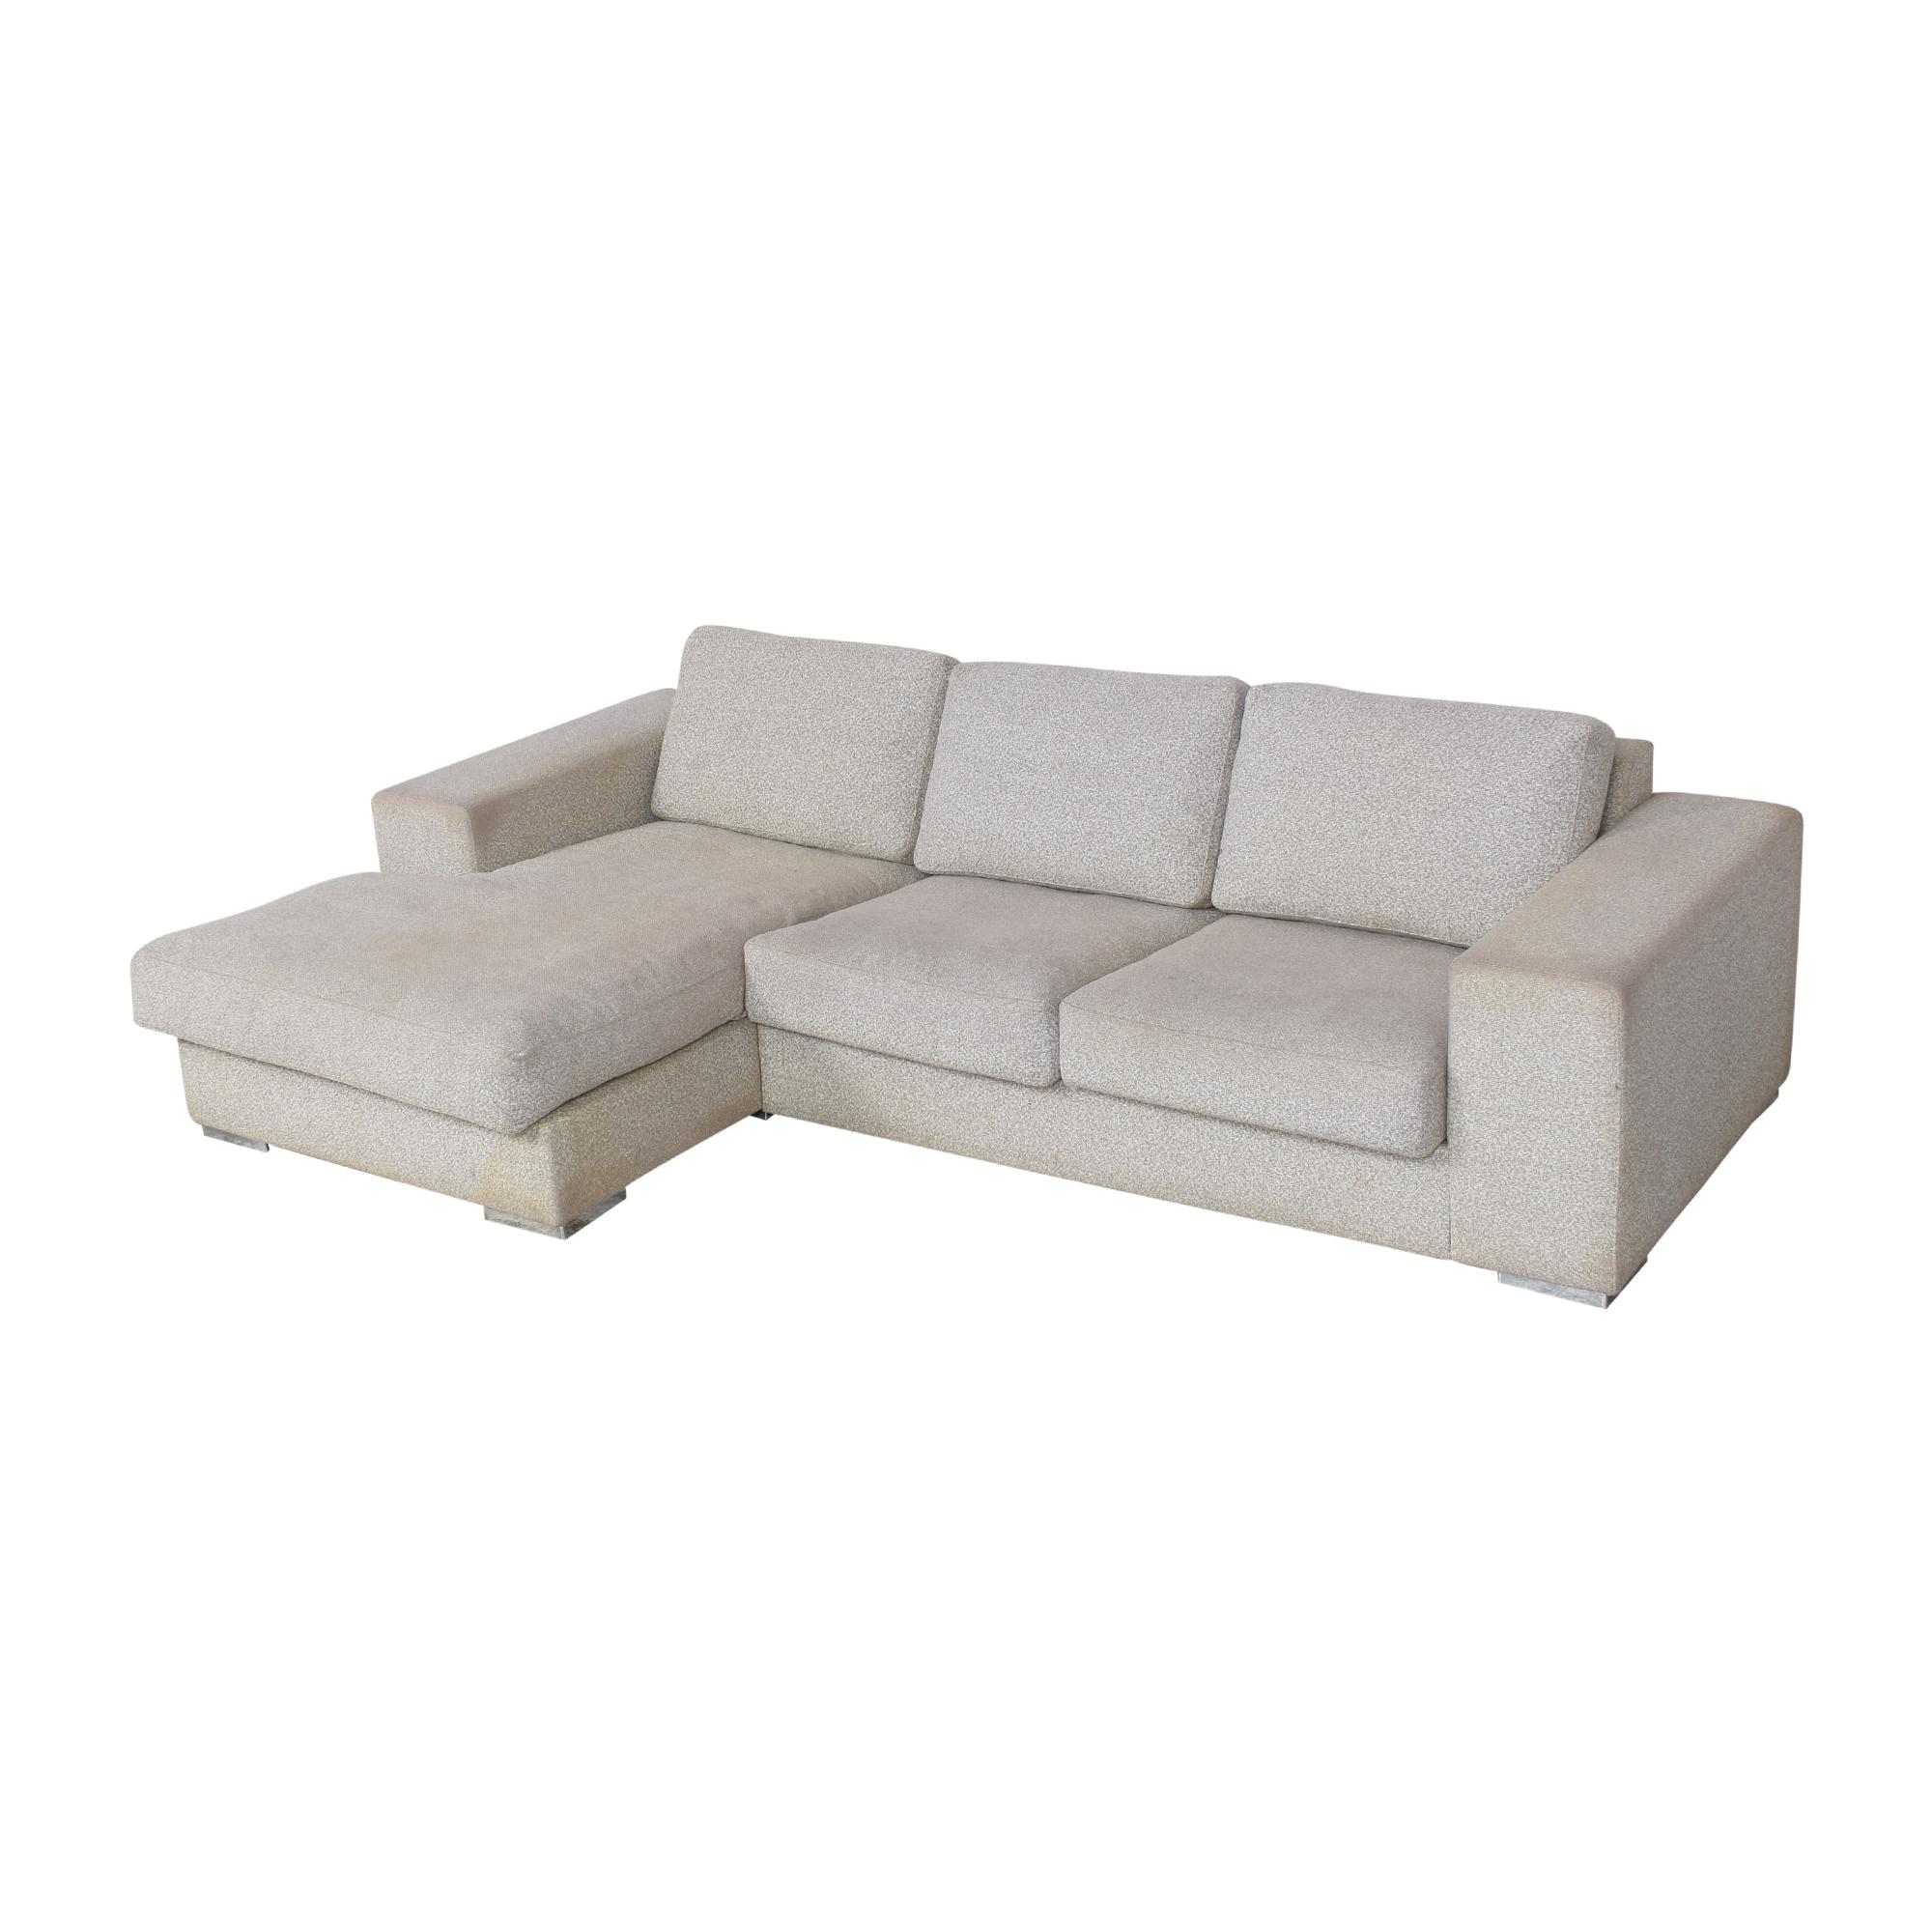 BoConcept Chaise Sectional Sofa sale